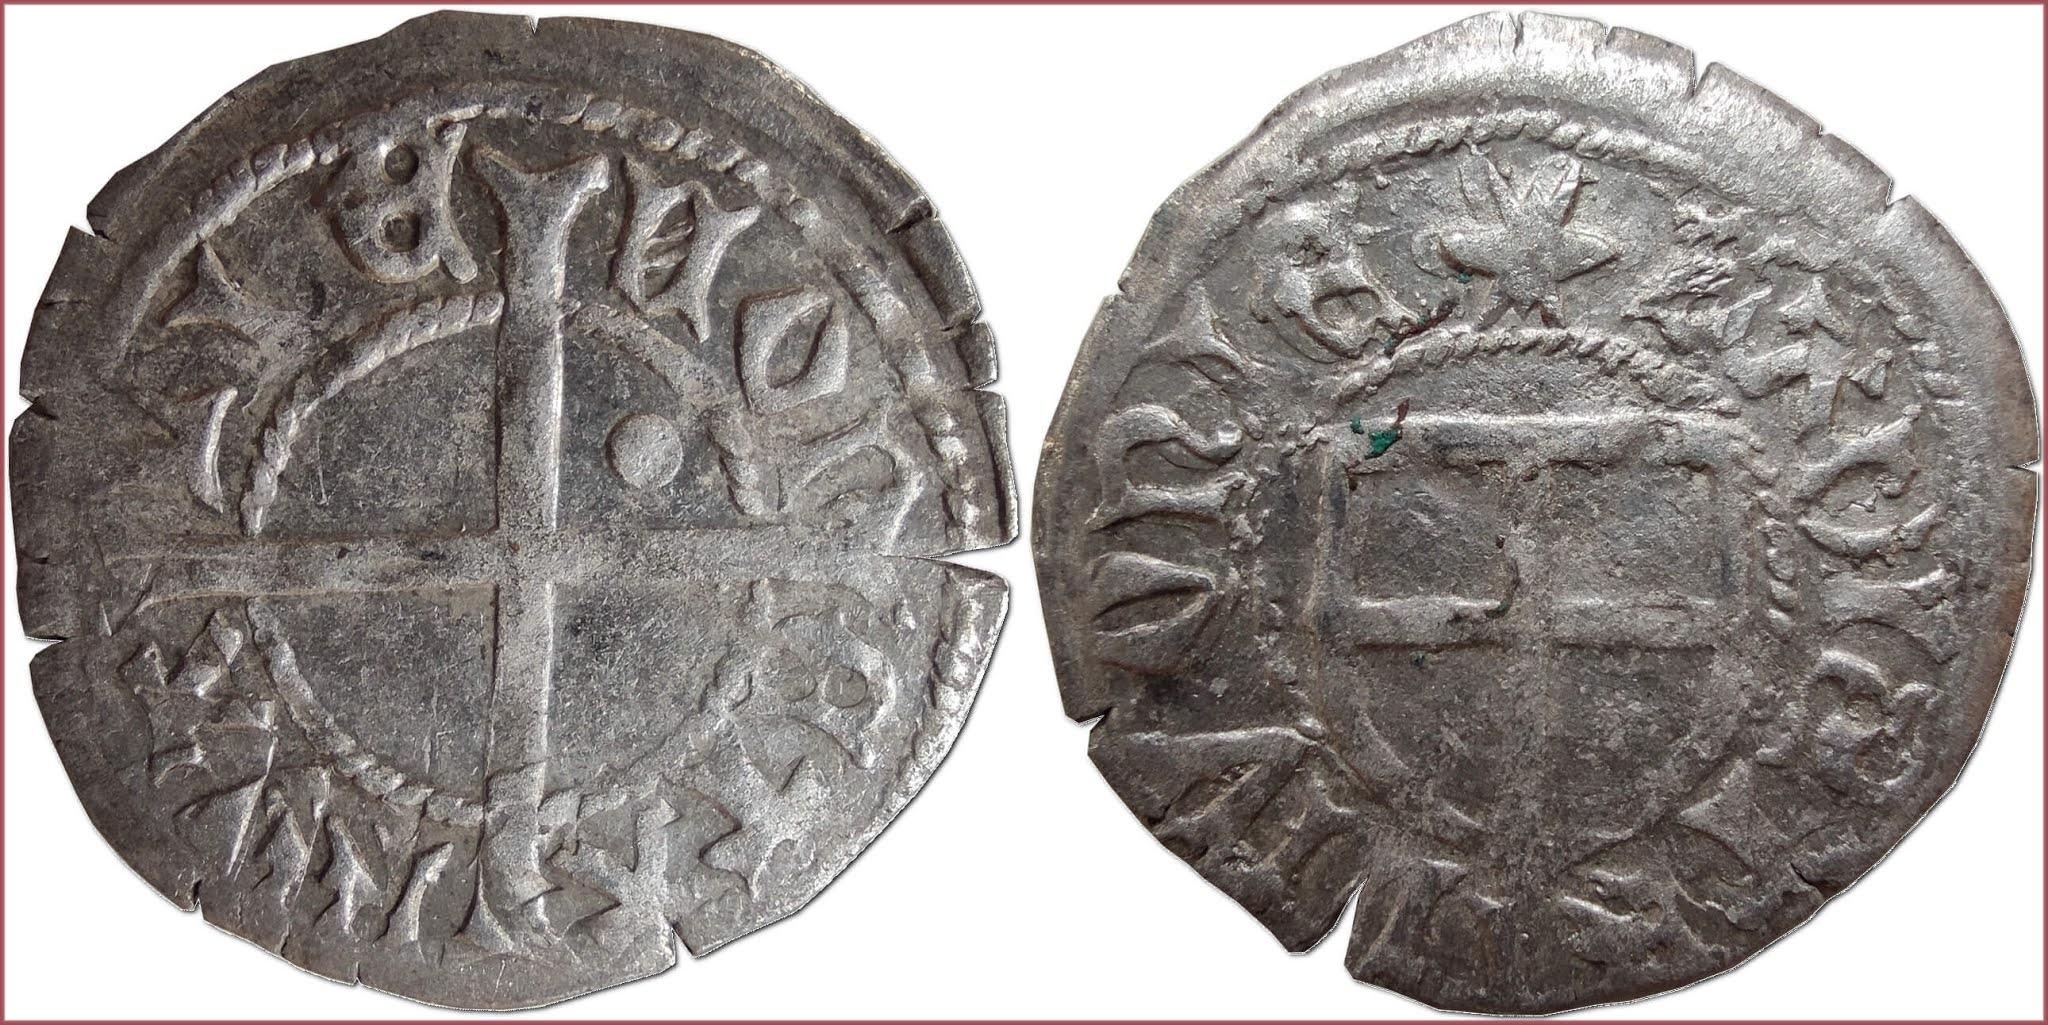 Livonian Schilling, 1471-1483: Livonian Order